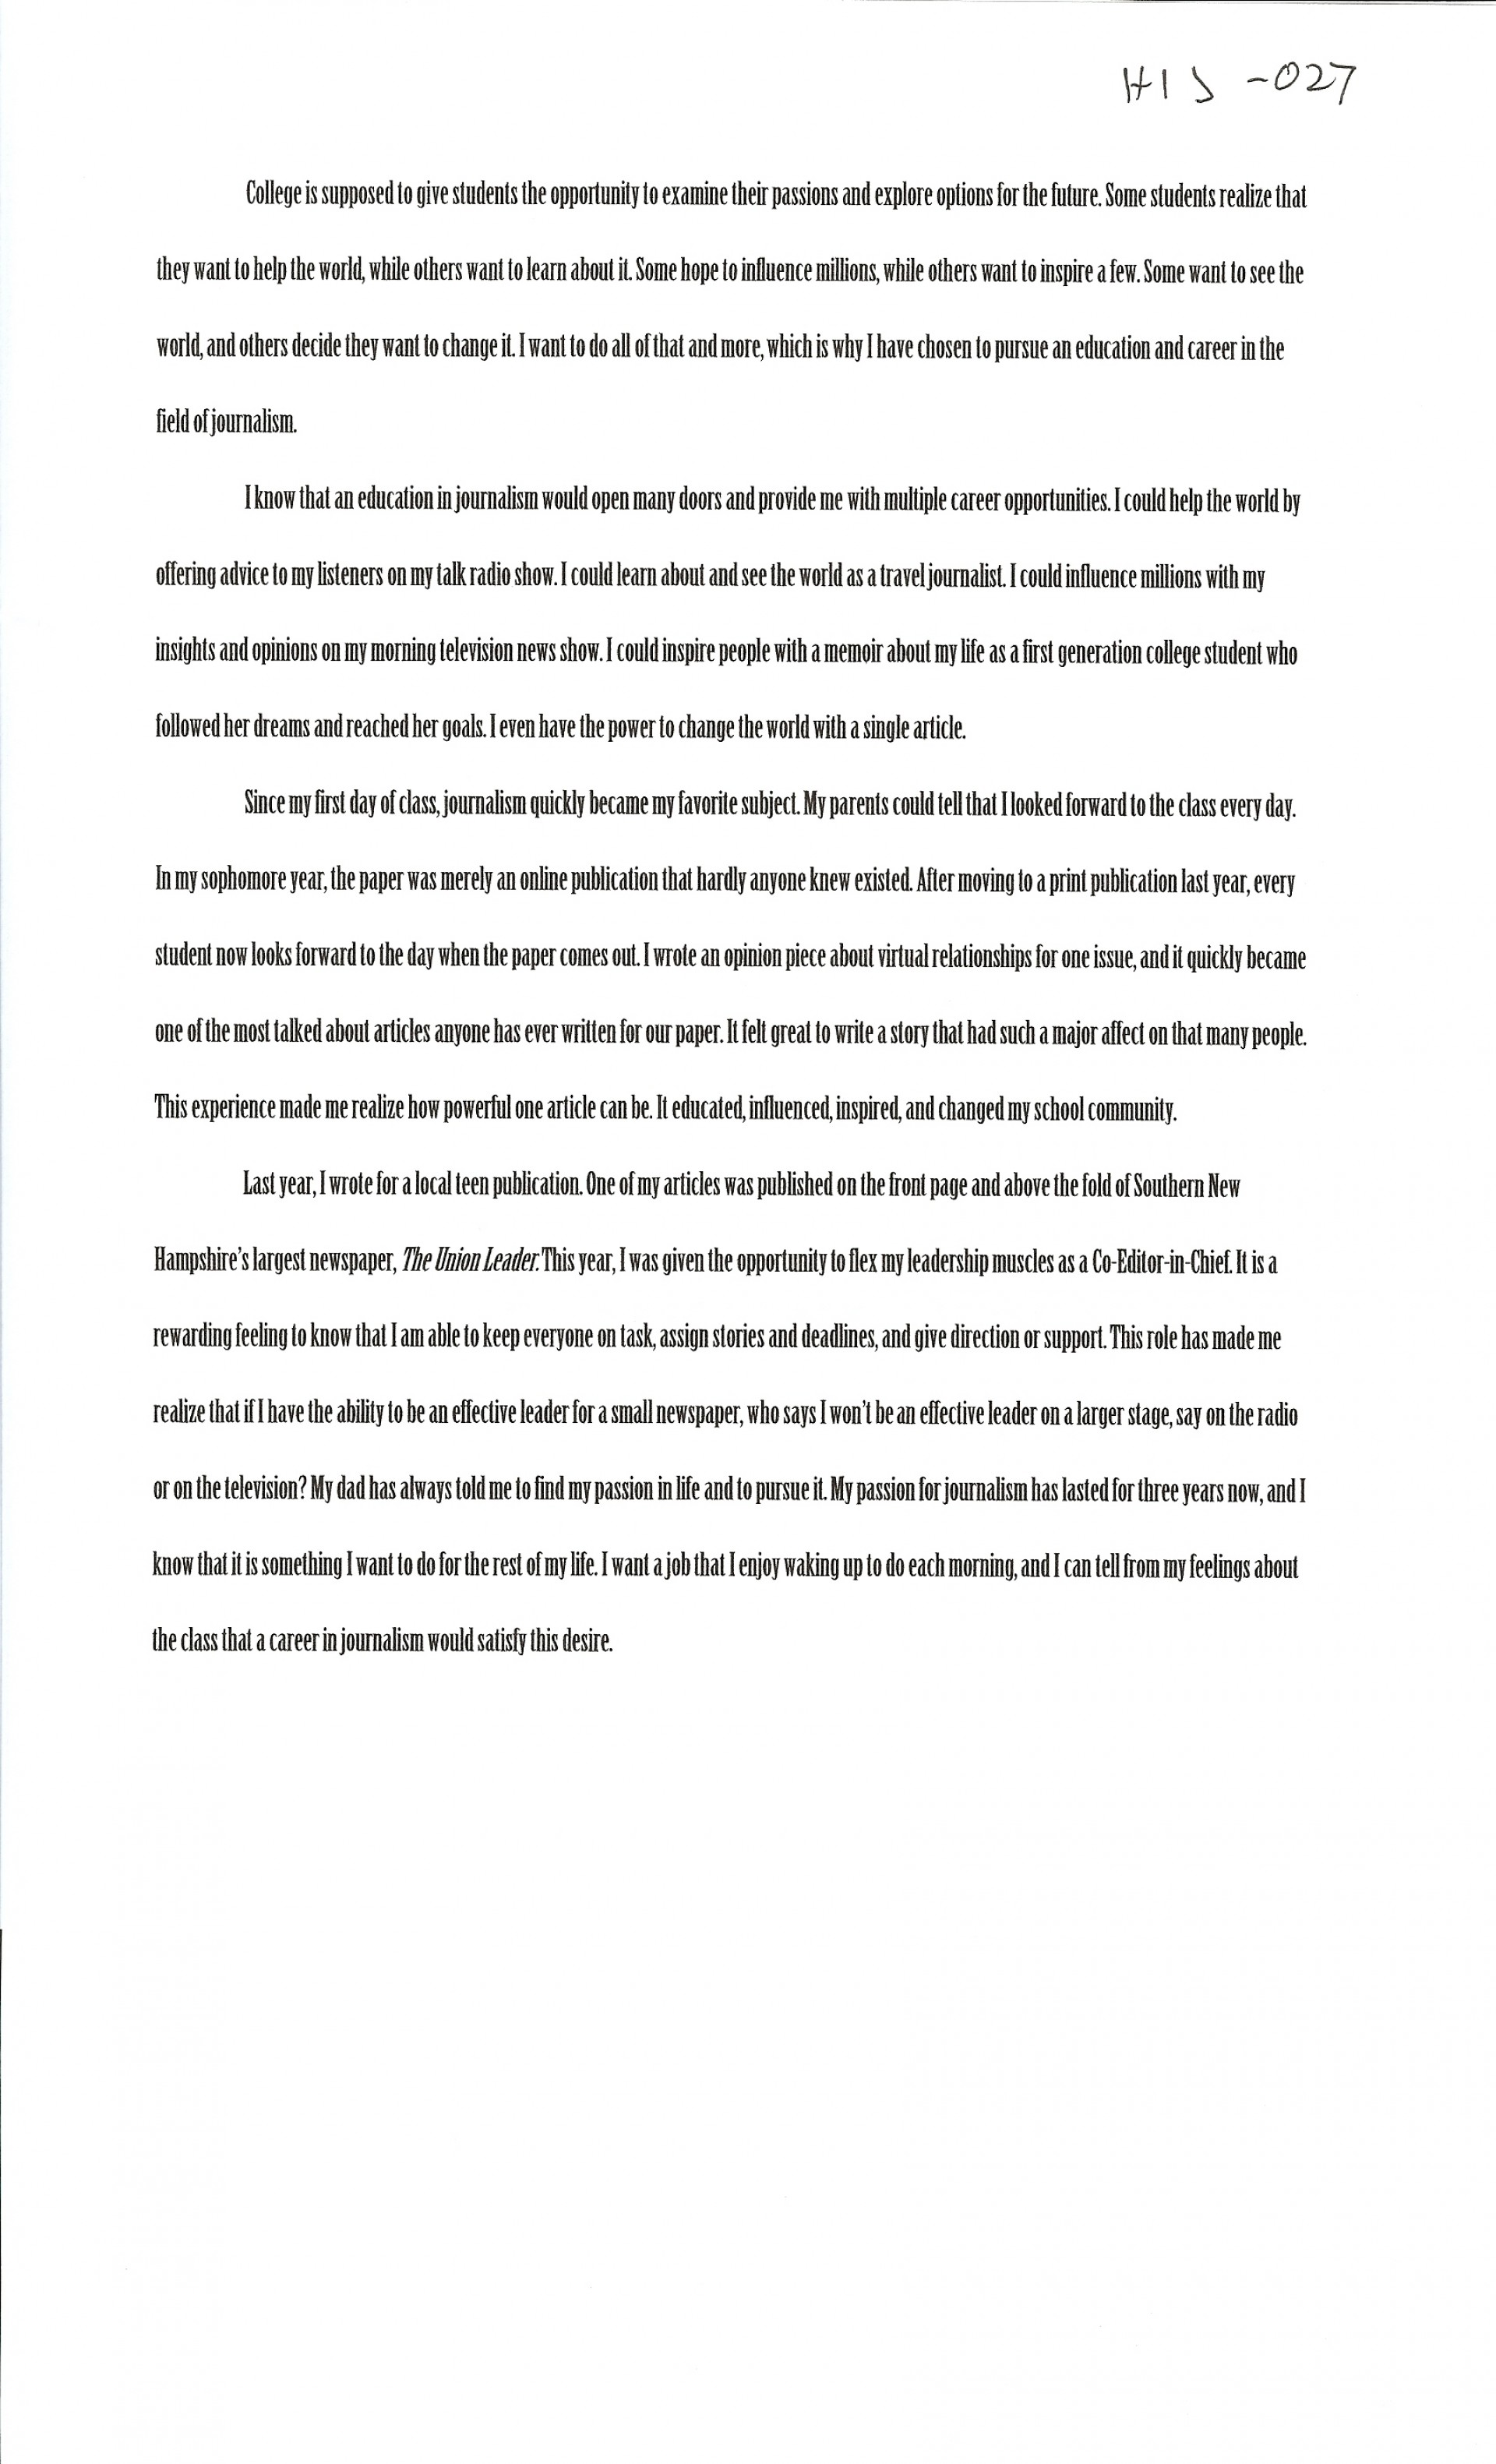 013 Winning Scholarship Essay Examples Example Alexa Serrecchia Stupendous College Pdf 1920